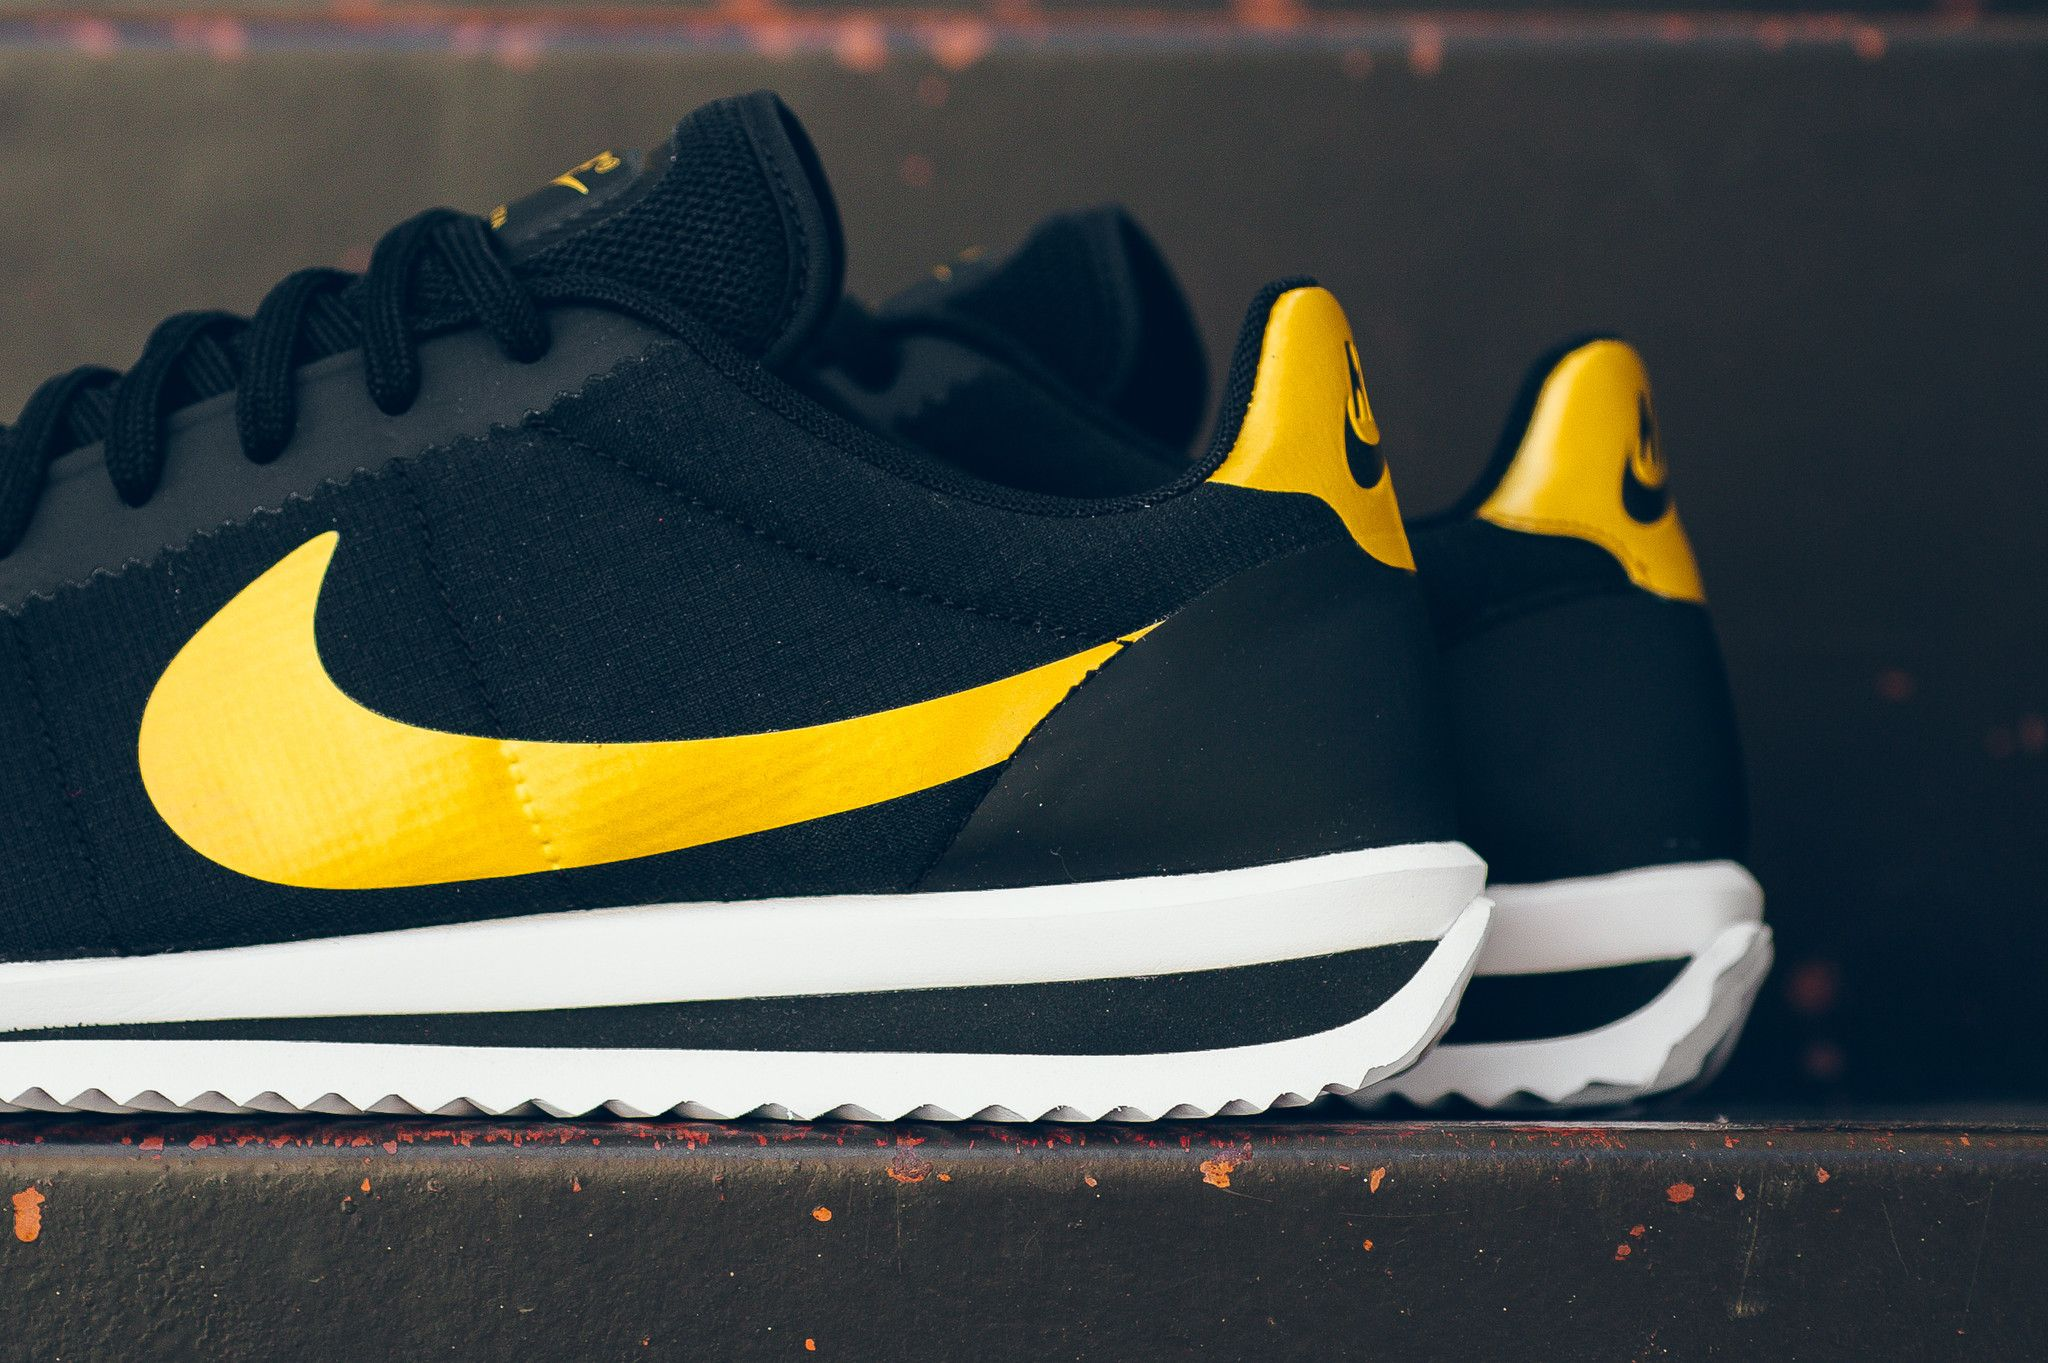 All Black & A Little Bit Of Gold On This Nike Cortez Ultra • KicksOnFire.com